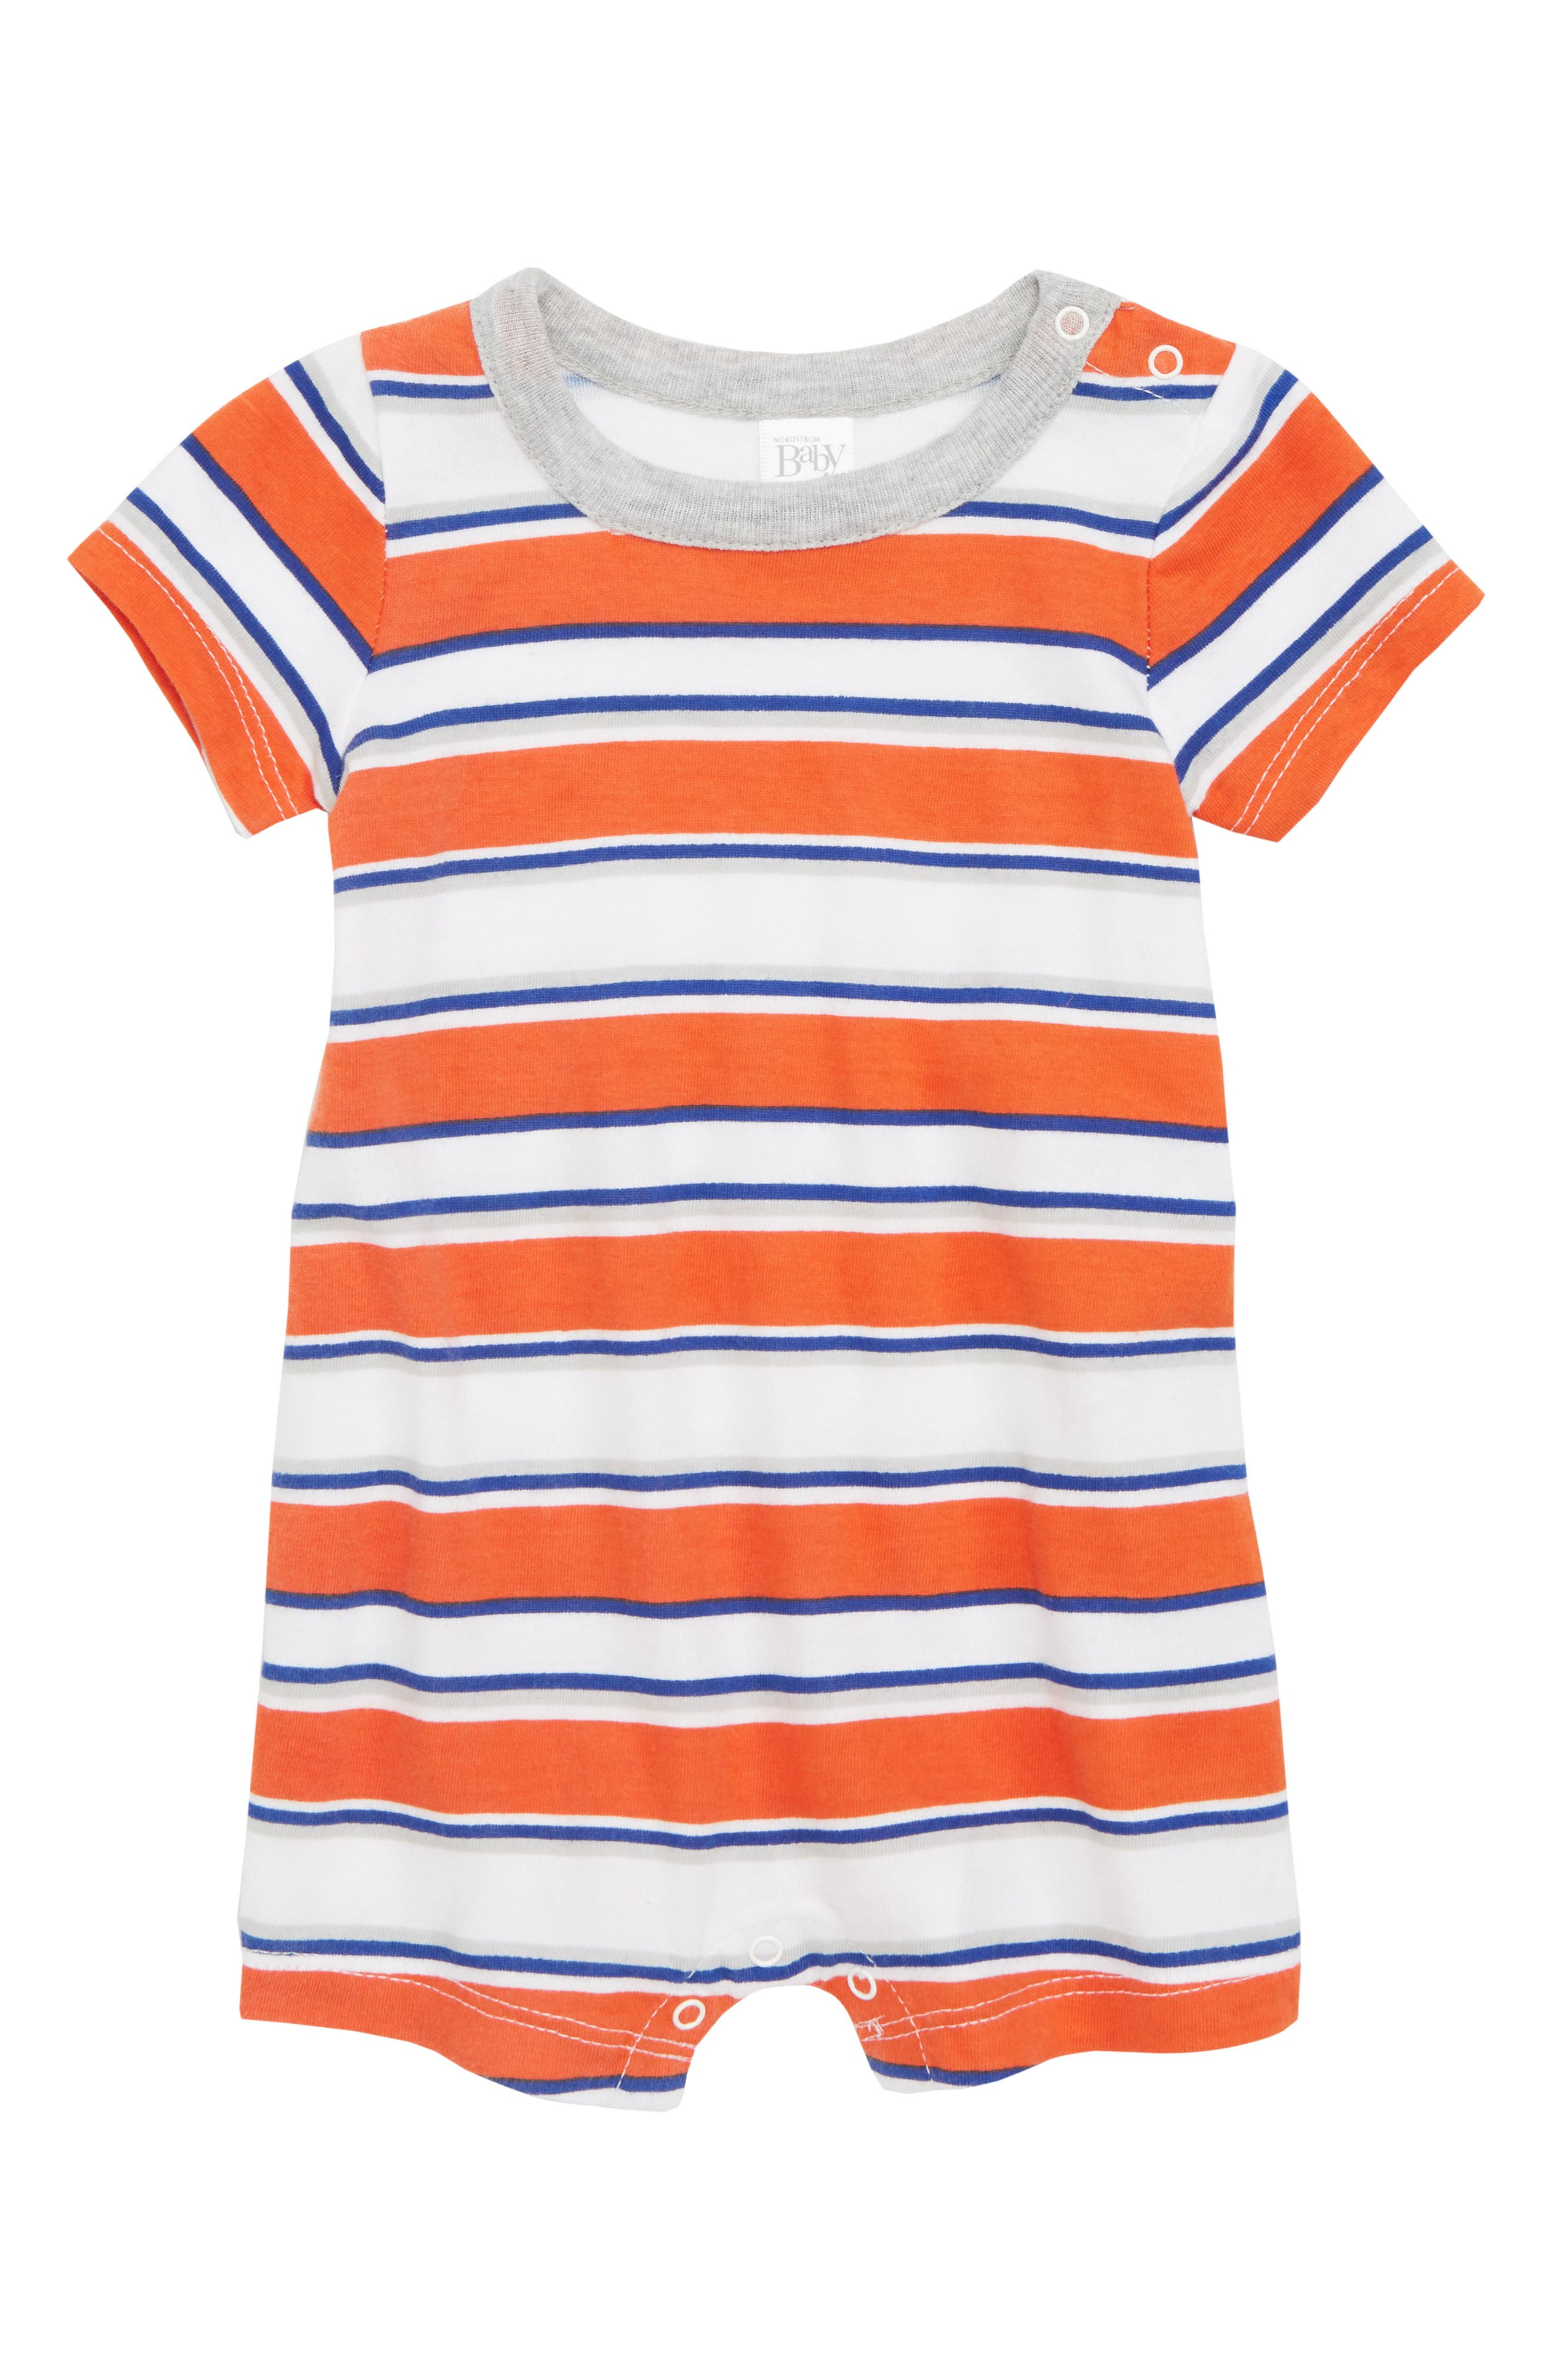 Nordstrom Baby Stripe Romper (Baby Boys)